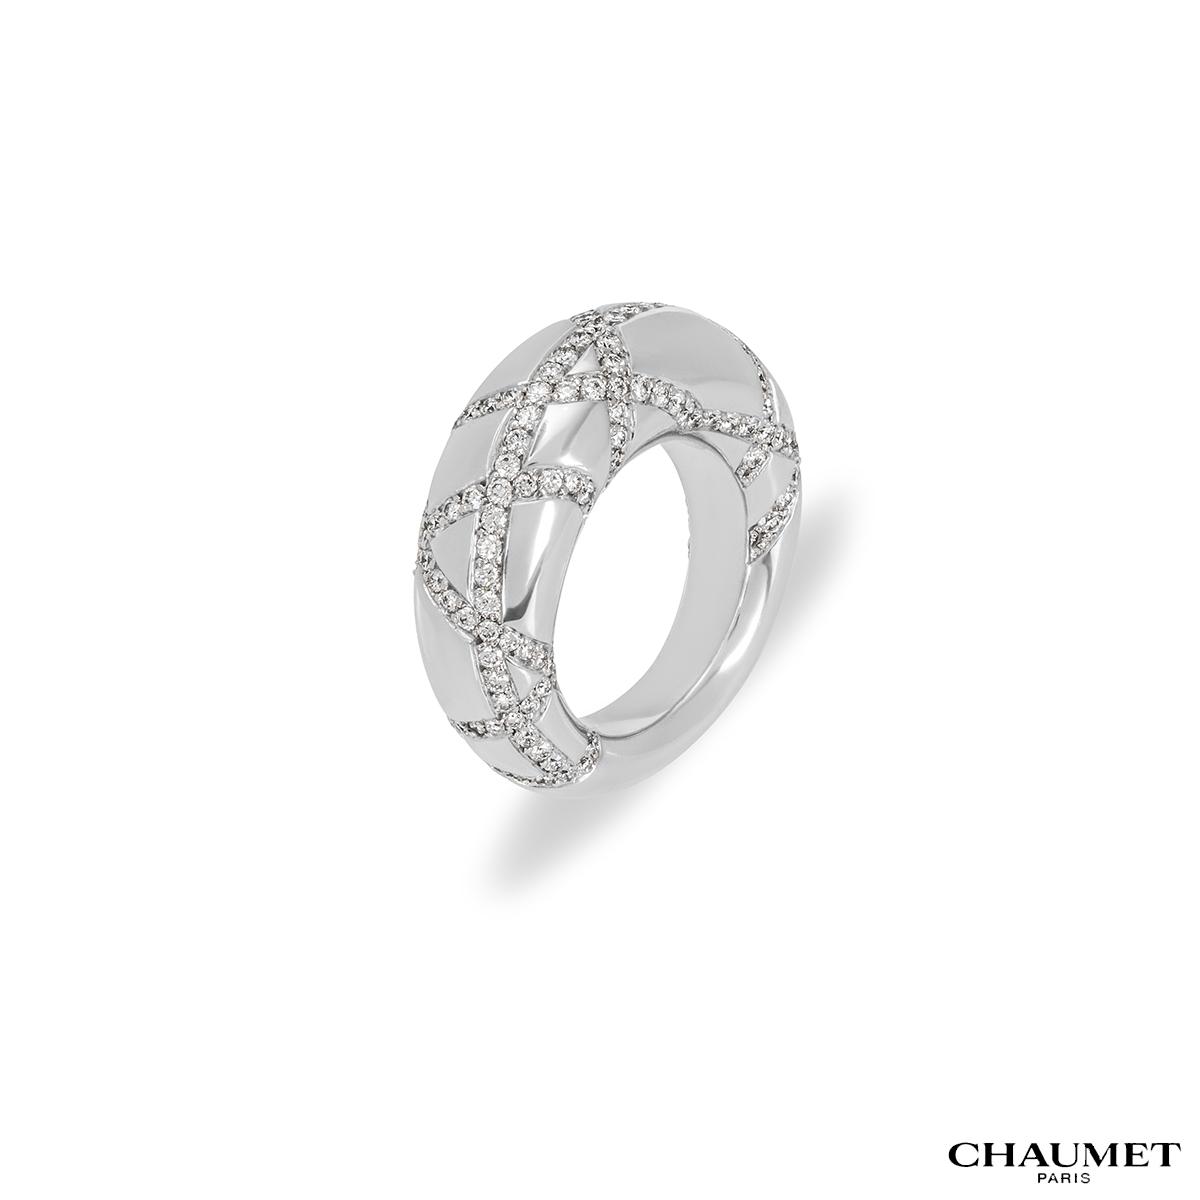 Chaumet White Gold Diamond Dress Ring